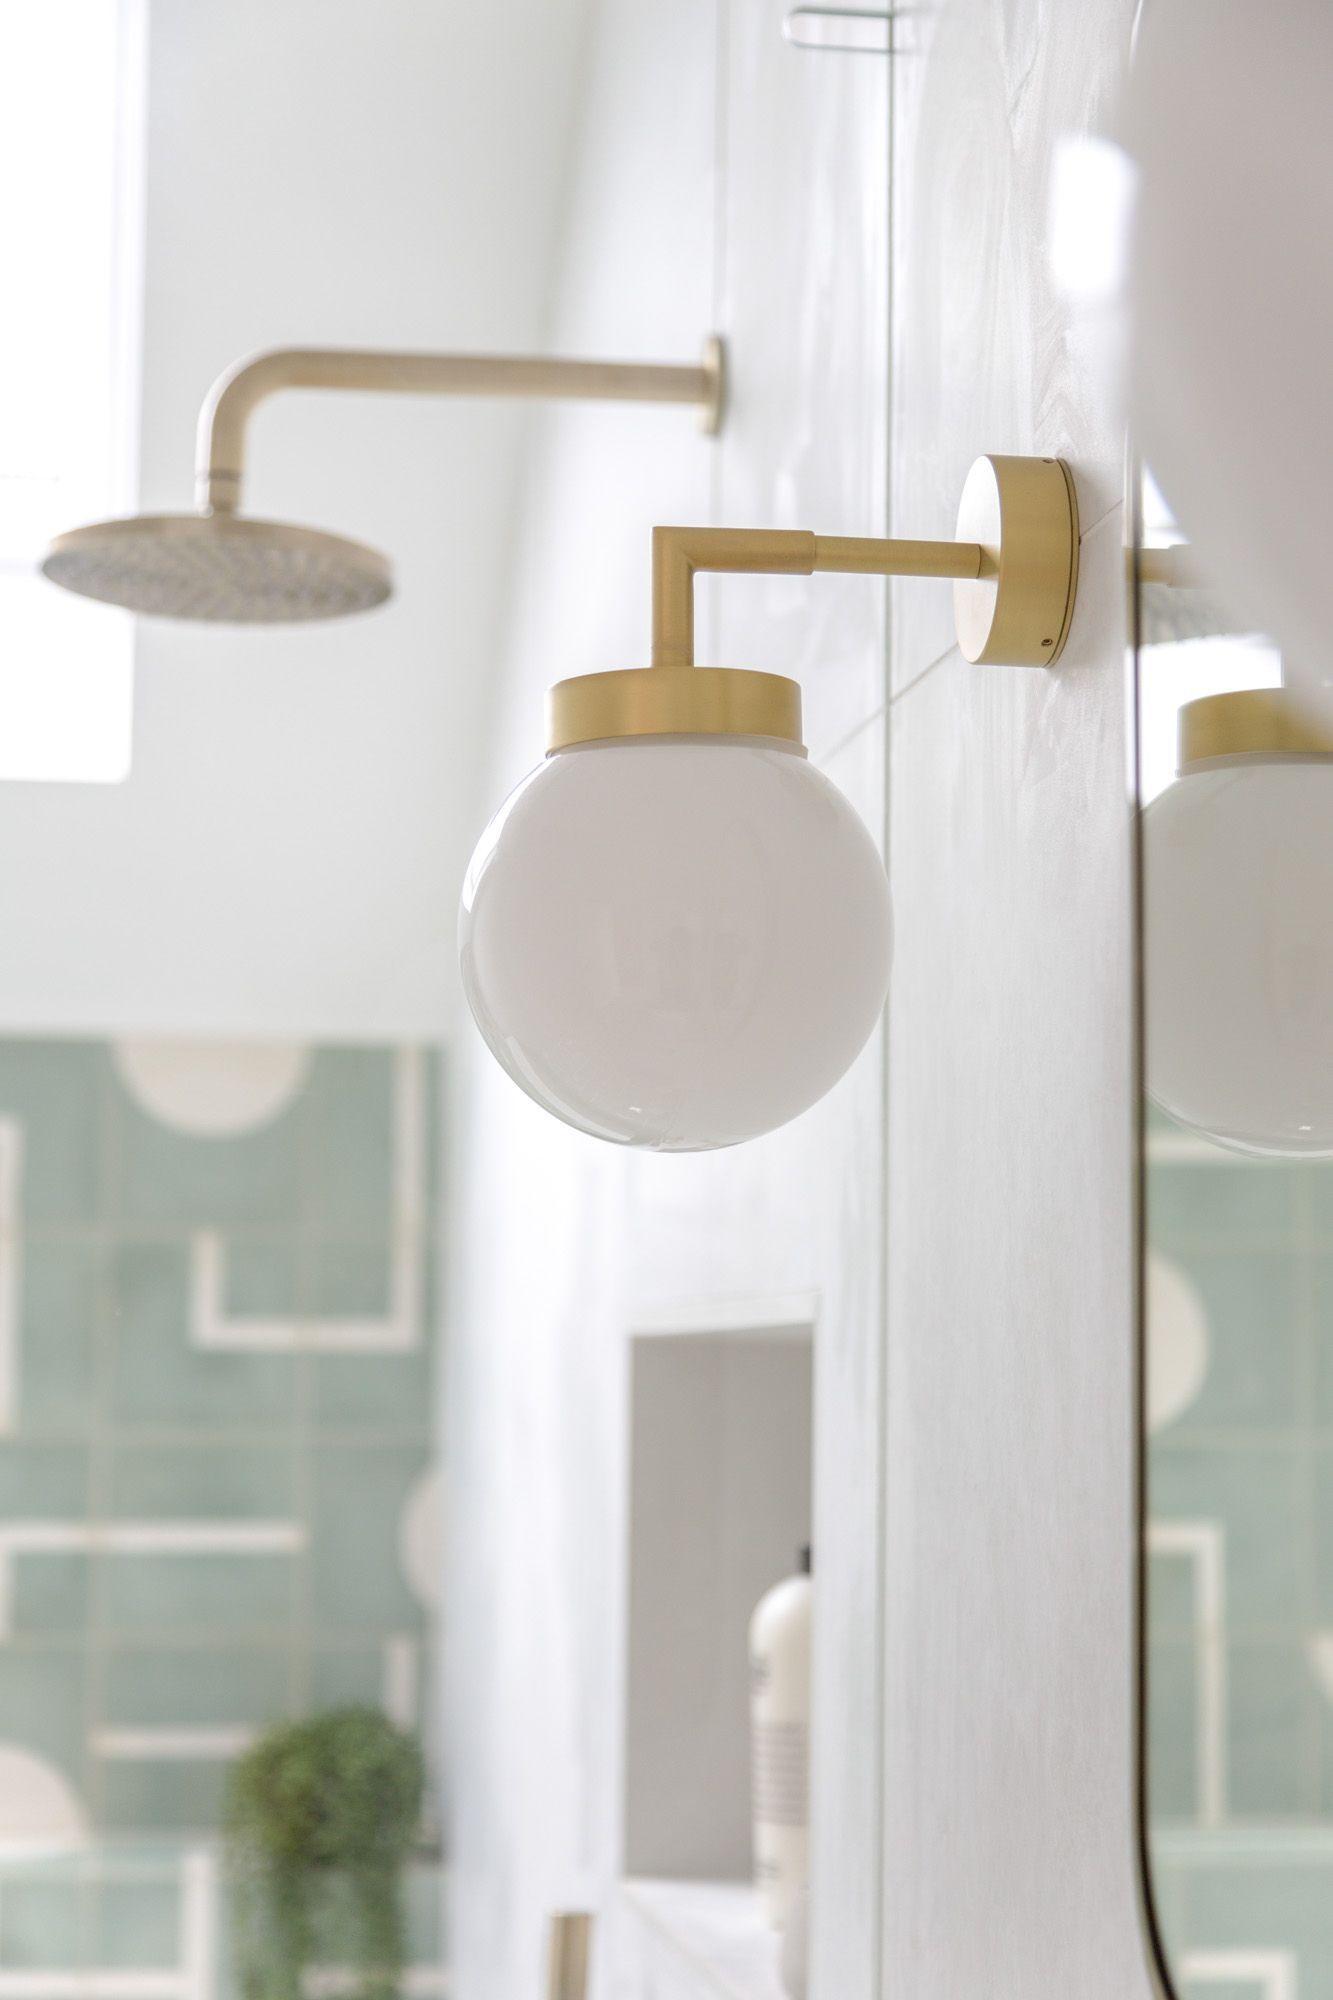 quality design af4a3 9dbd8 Jordan wall light IP65   Bathroom & outdoor lighting in 2019 ...